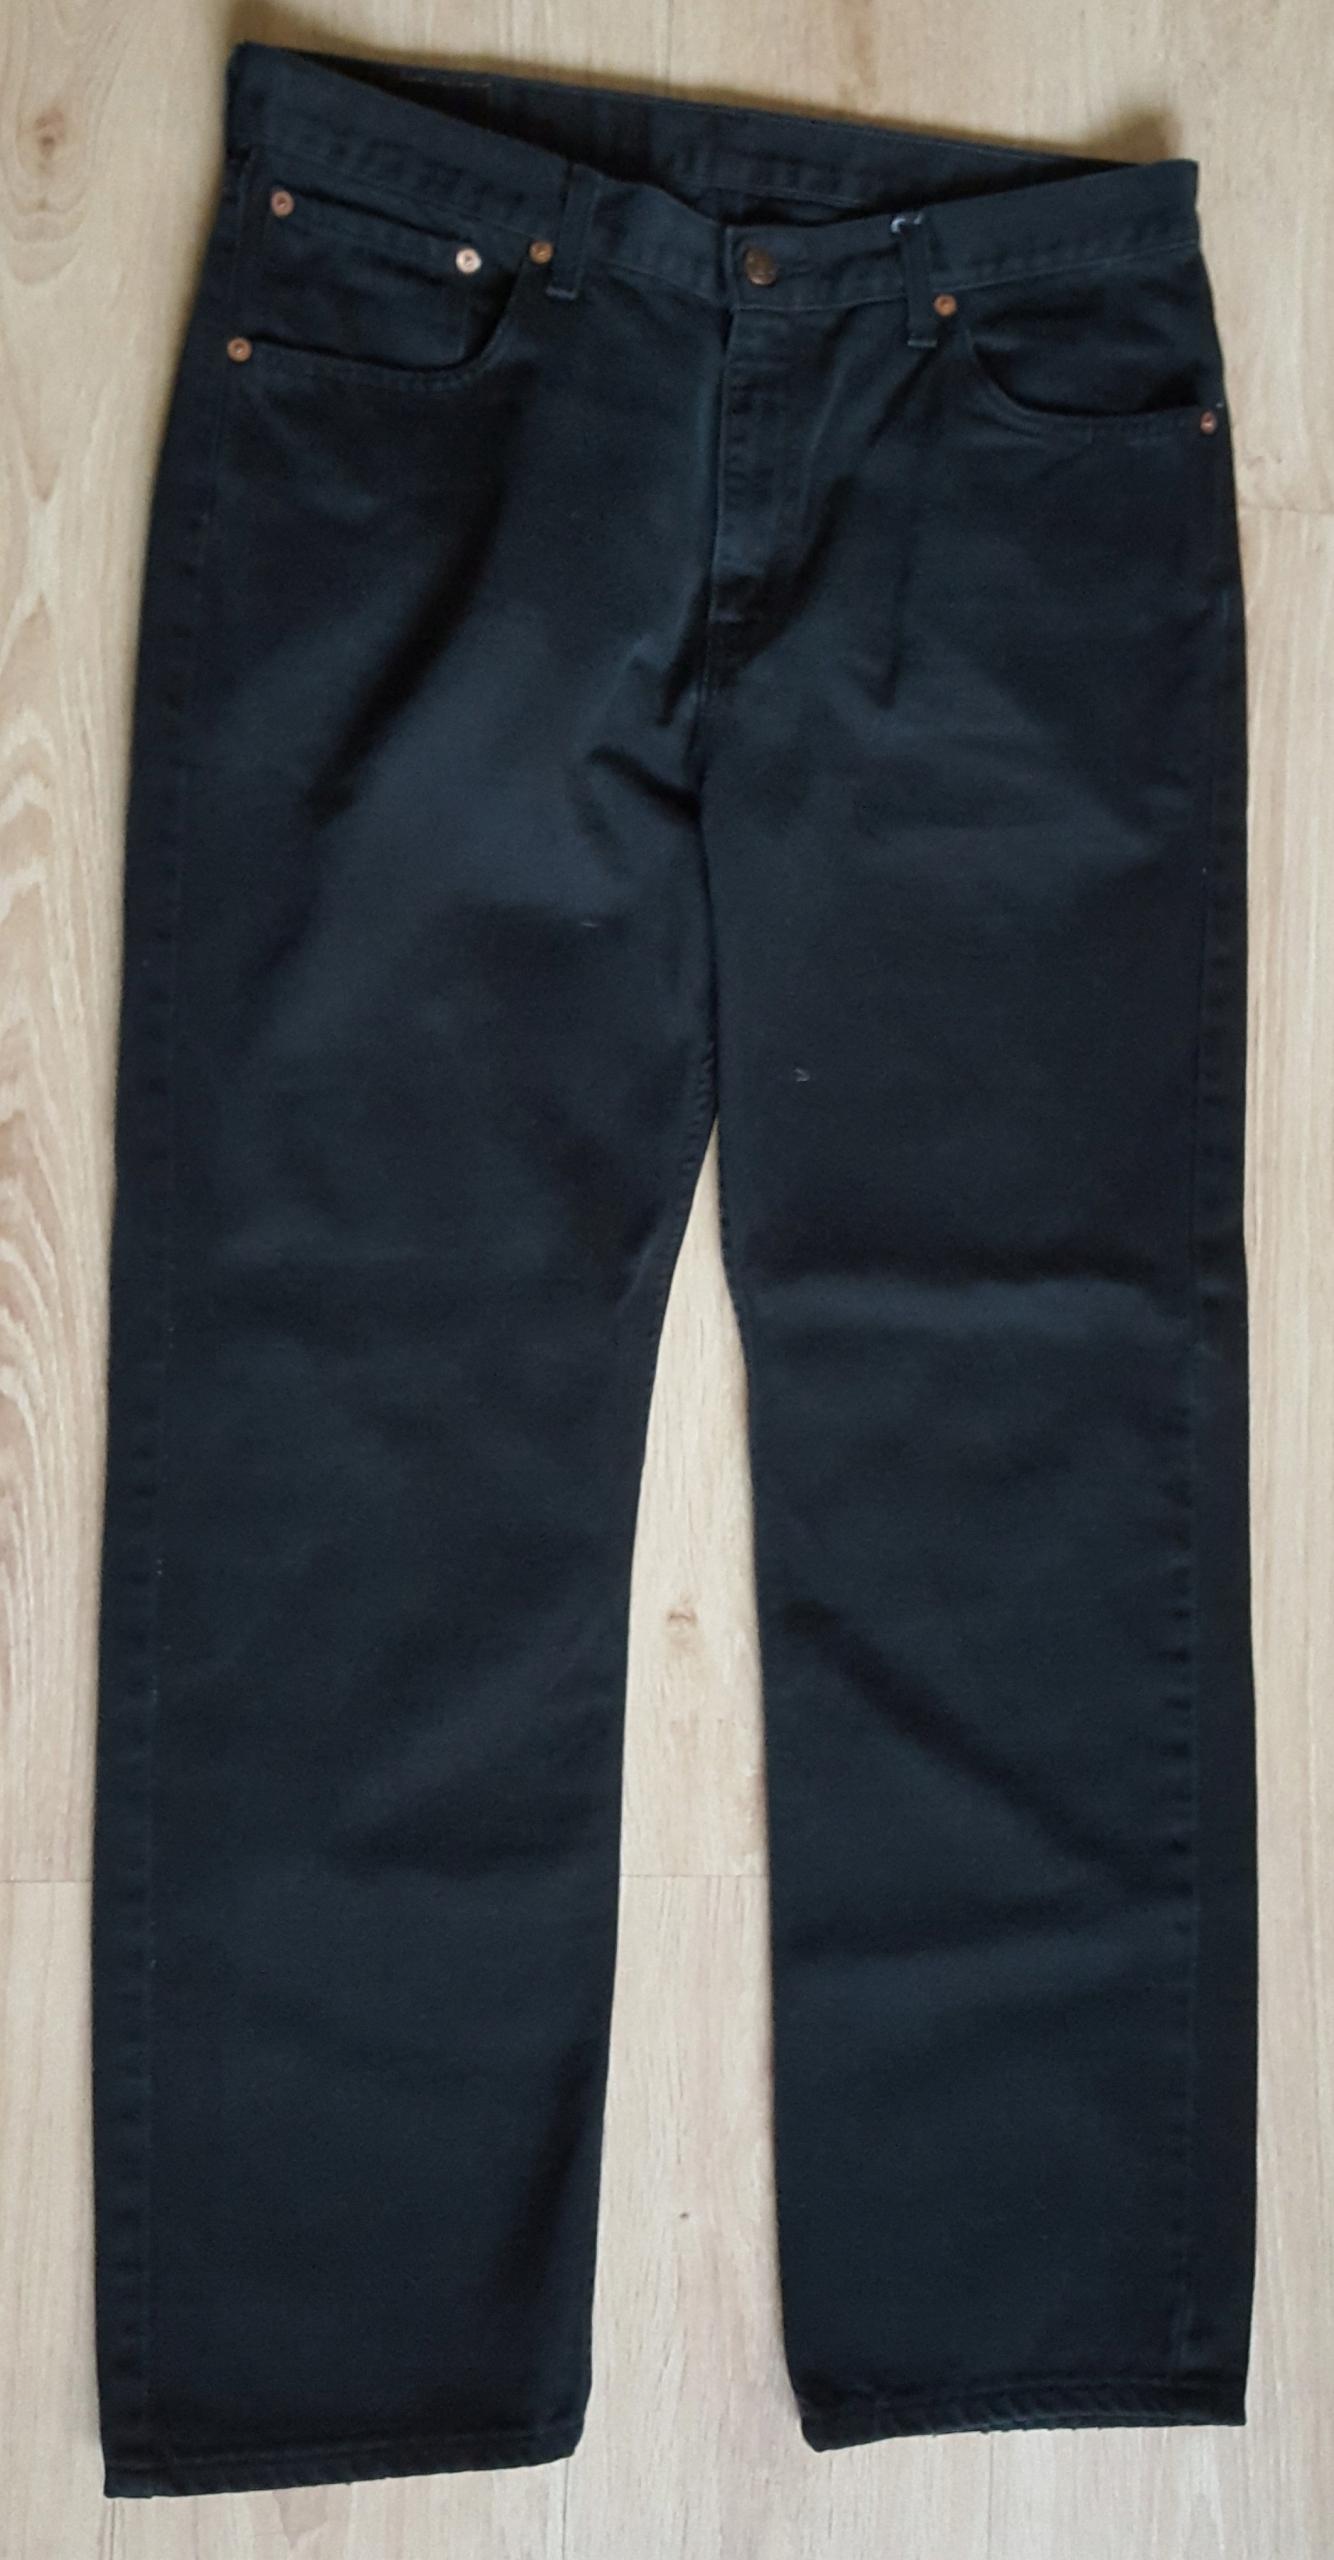 81e0512cb5 LEVI STRAUSS 751 W36 L30 pas 92 - 94 cm jeansy - 7735206343 ...